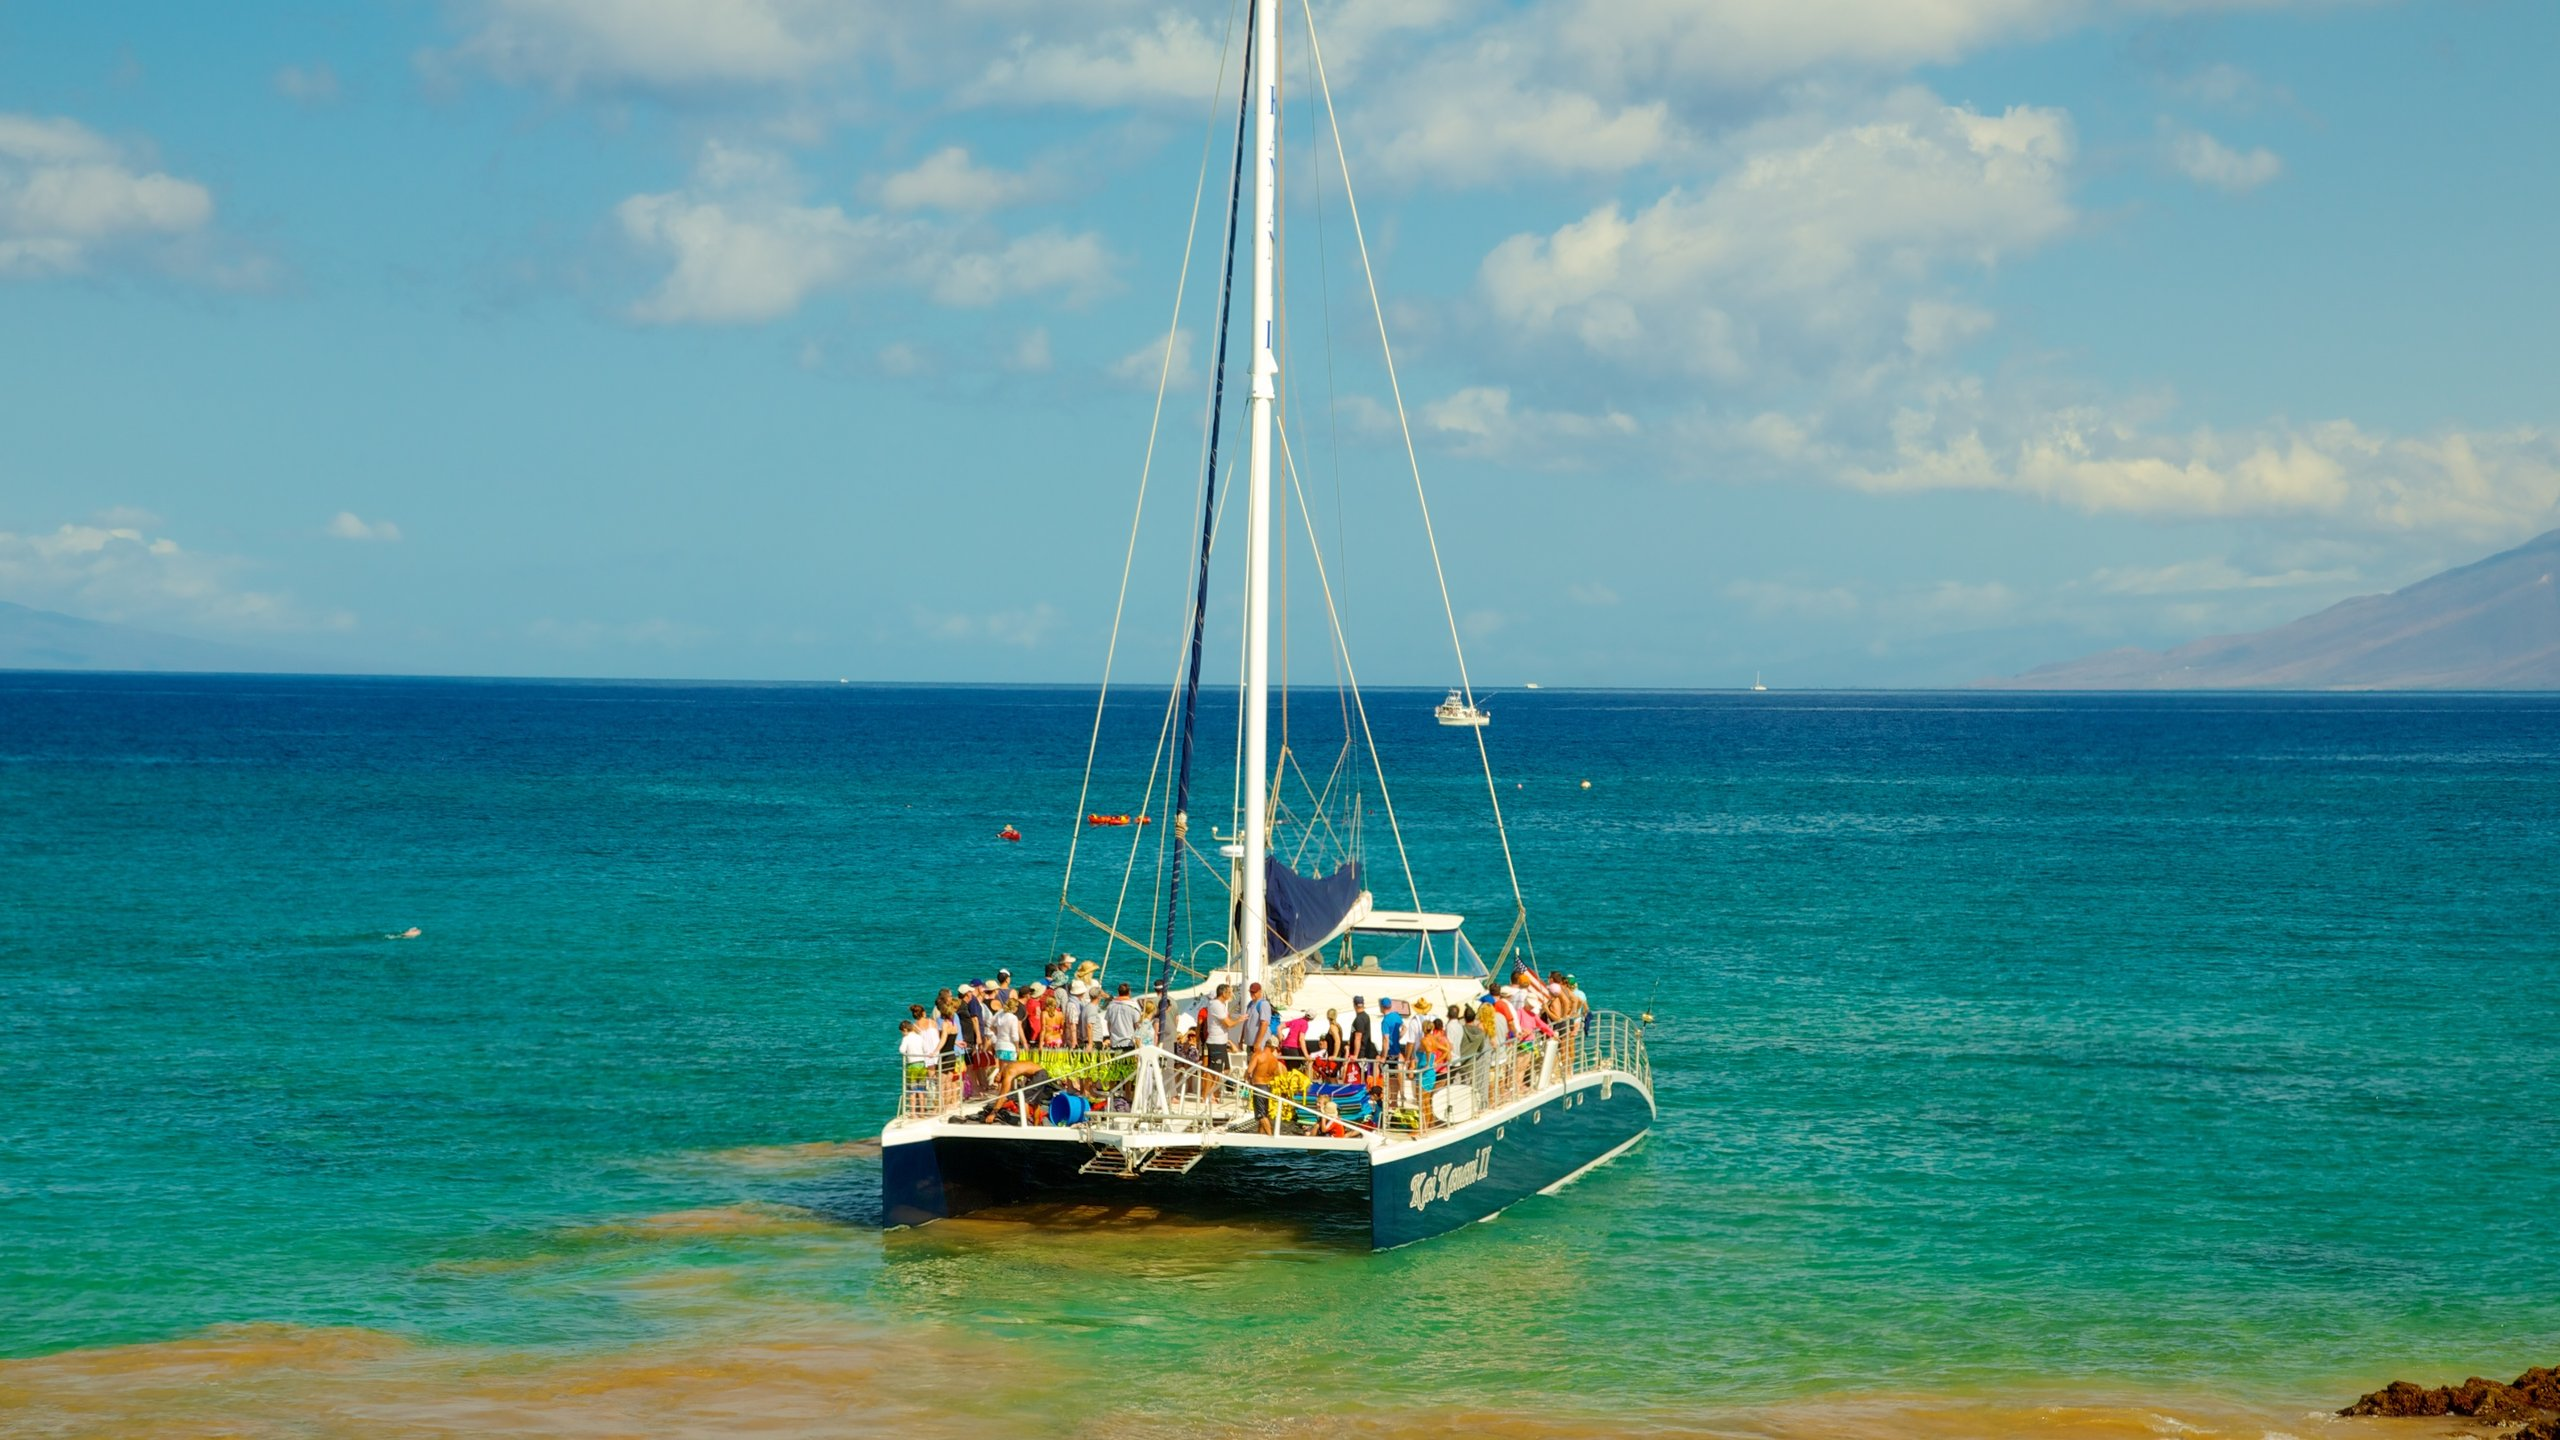 Molokini, Hawaii, United States of America